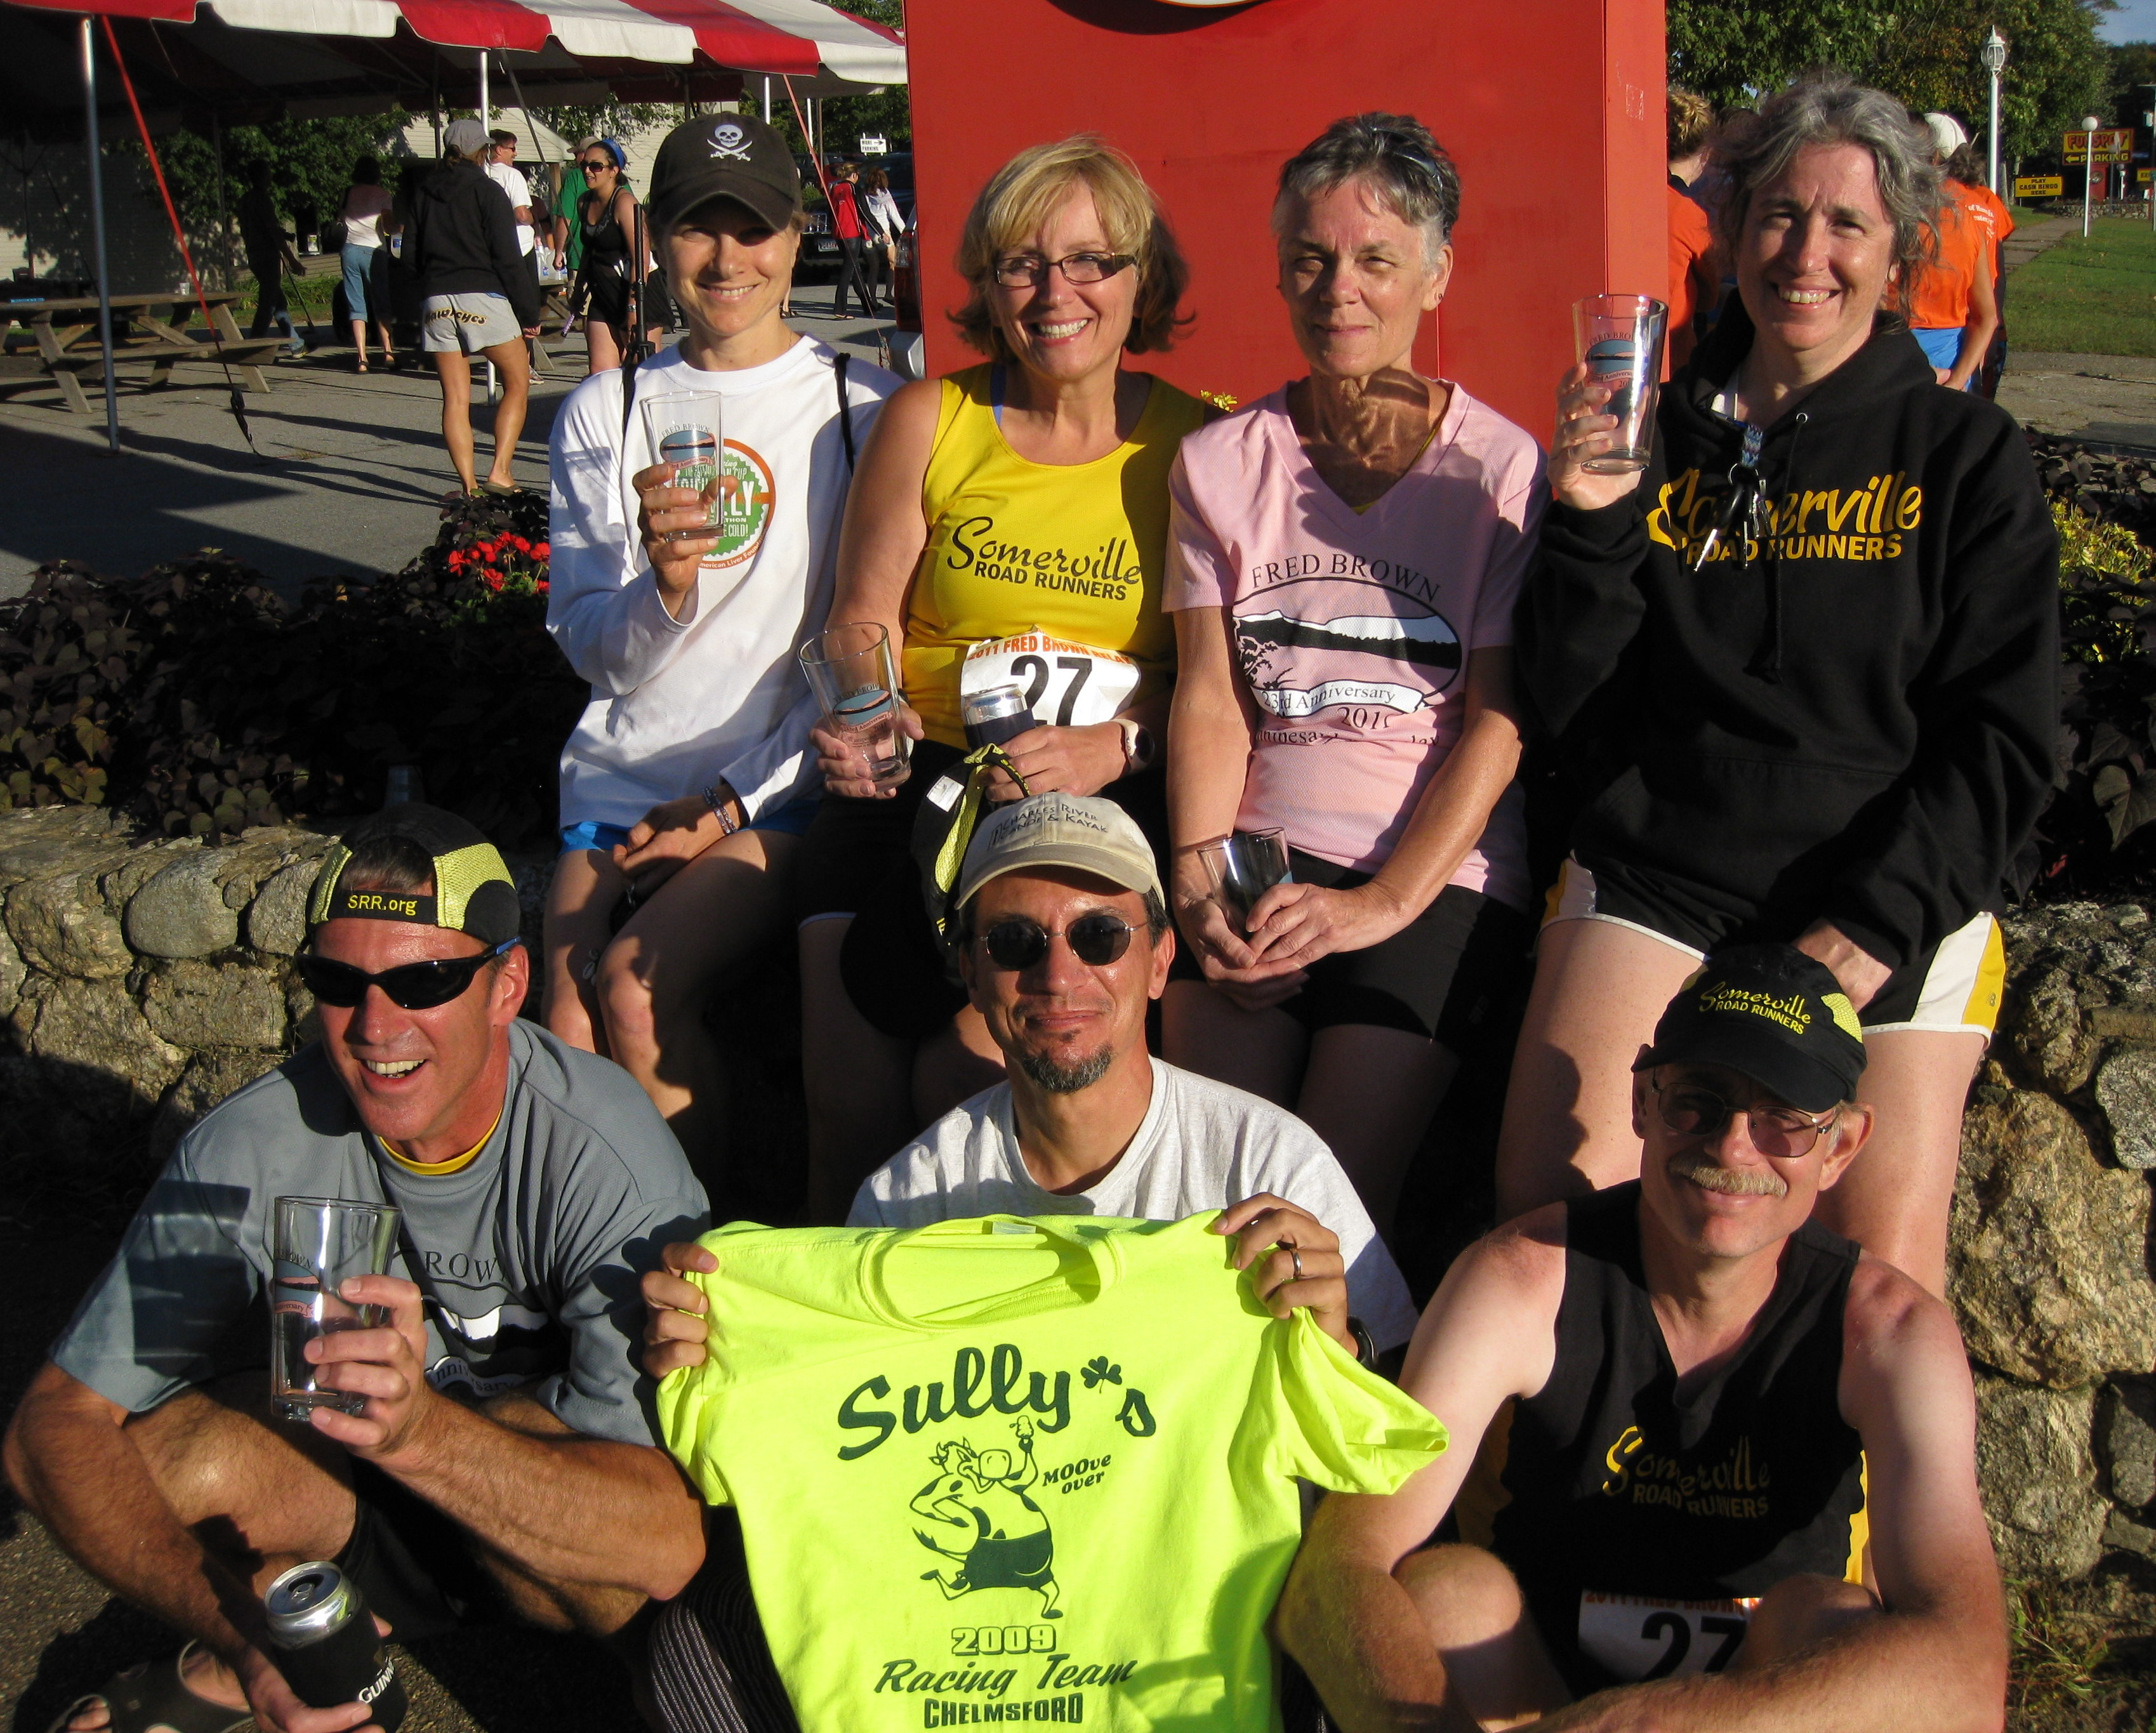 Senior Road Runners